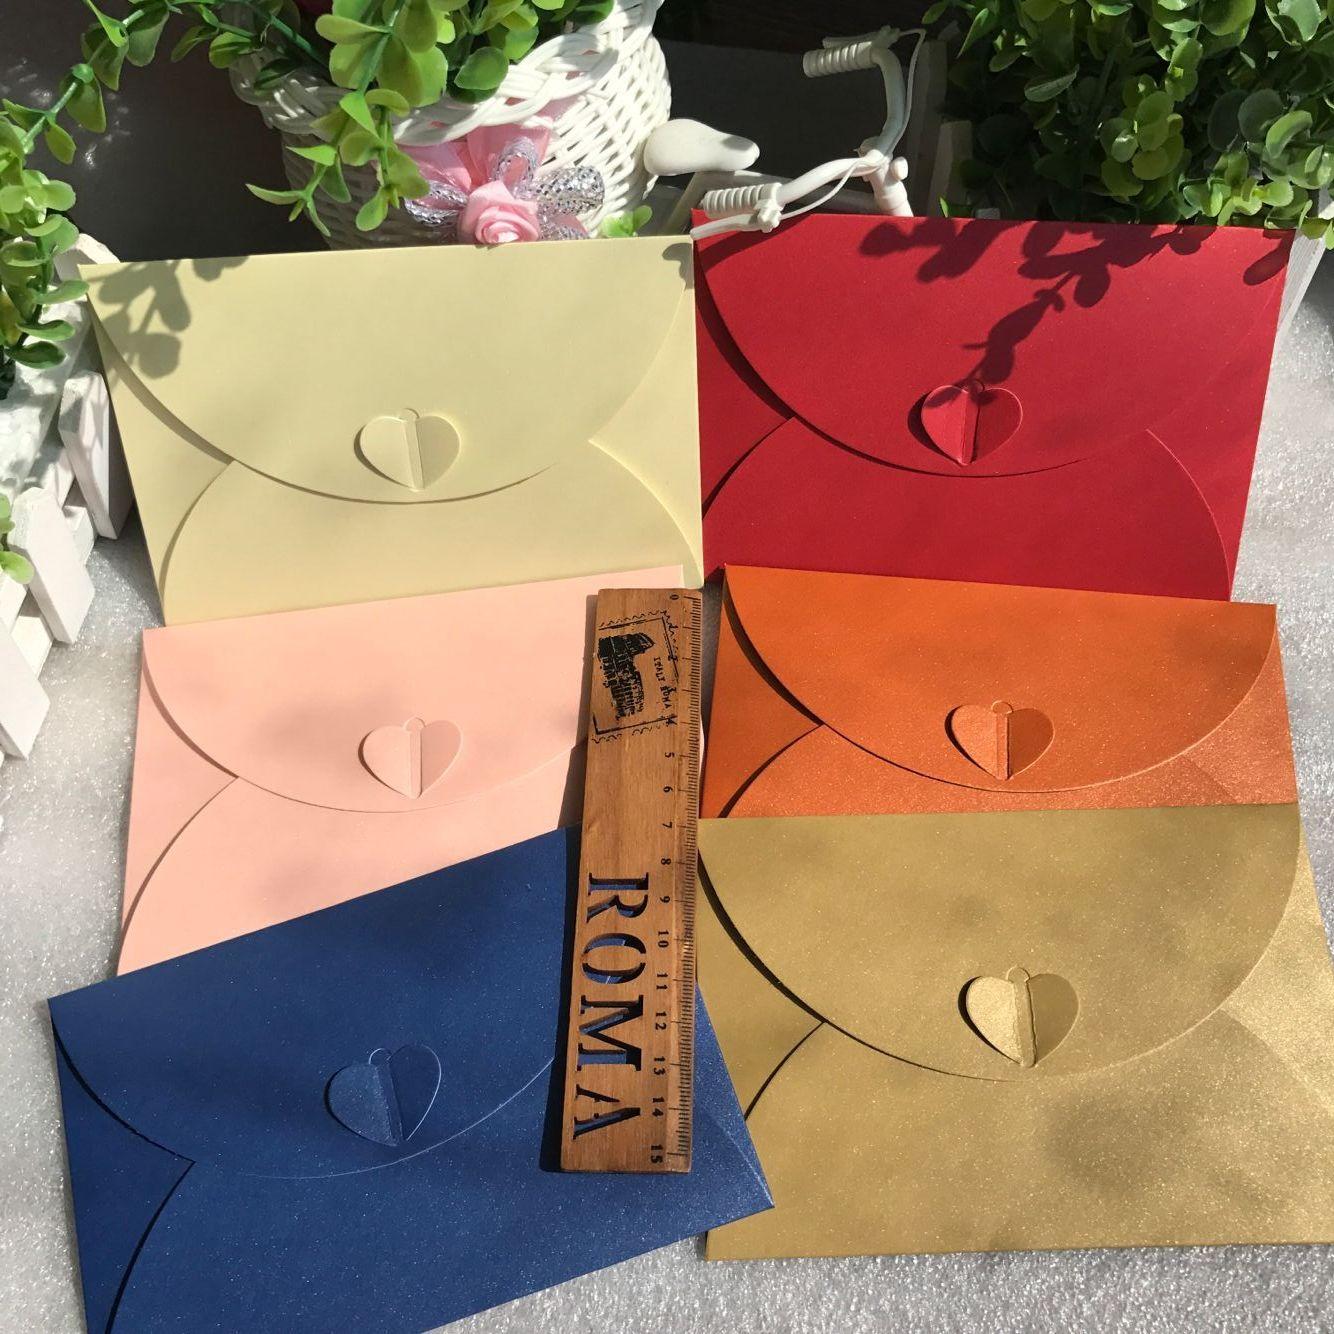 50pcs/lot Vintage Paper Envelopes Retro Classic Western Bronzing Business Decorated Wedding Invitation Envelope 17.5*11cm